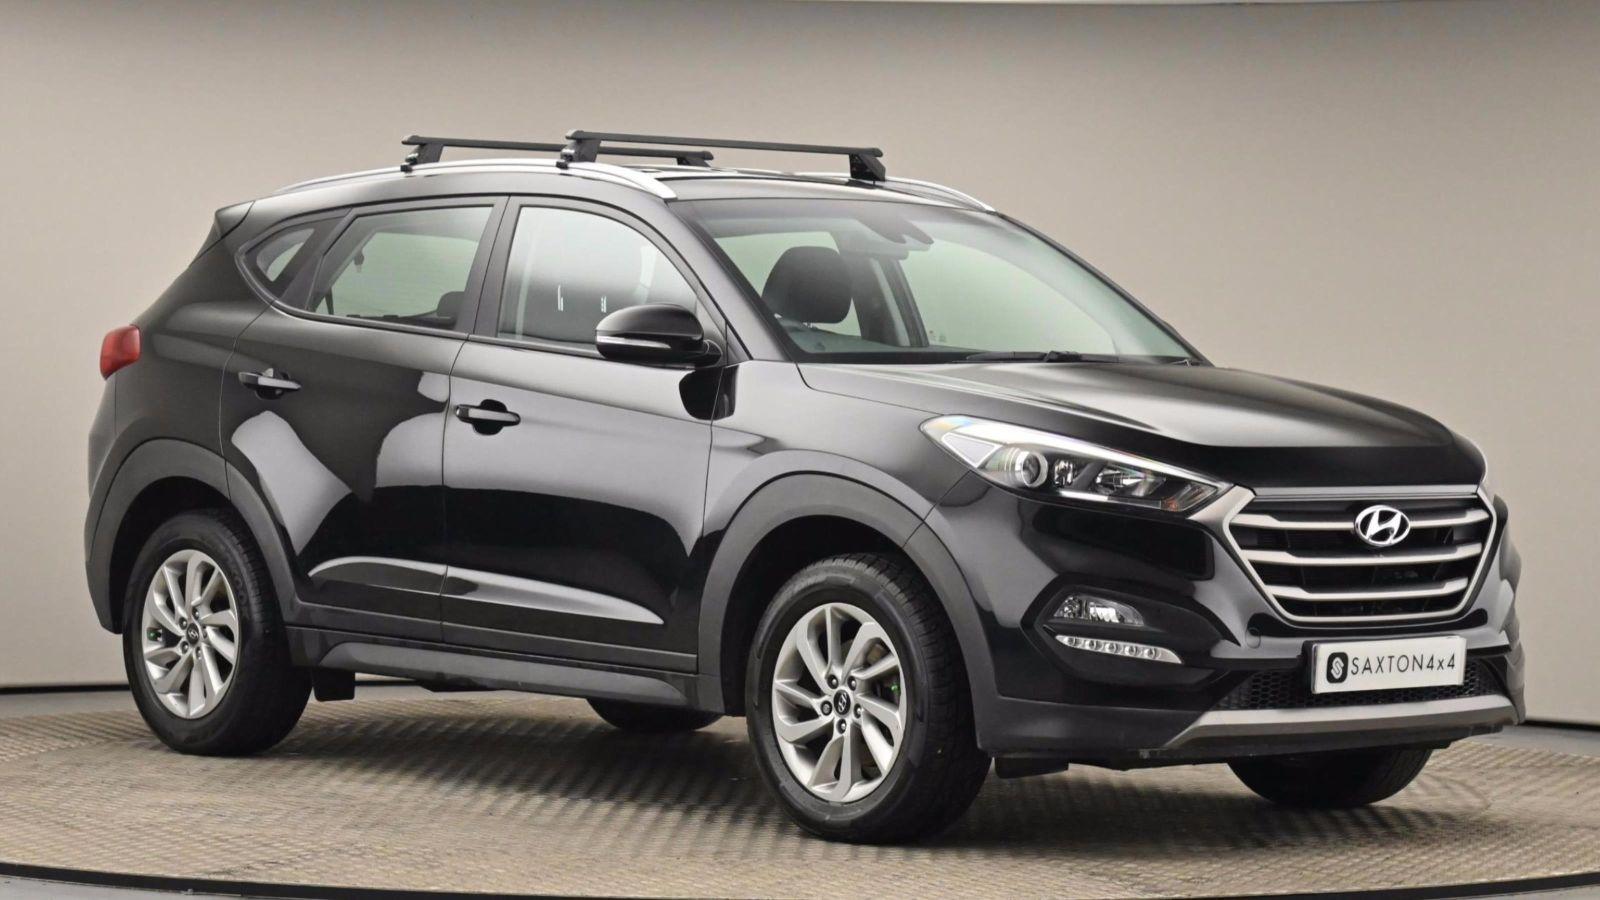 Used 2016 Hyundai TUCSON 1.6 GDi Blue Drive SE Nav 5dr 2WD BLACK at Saxton4x4